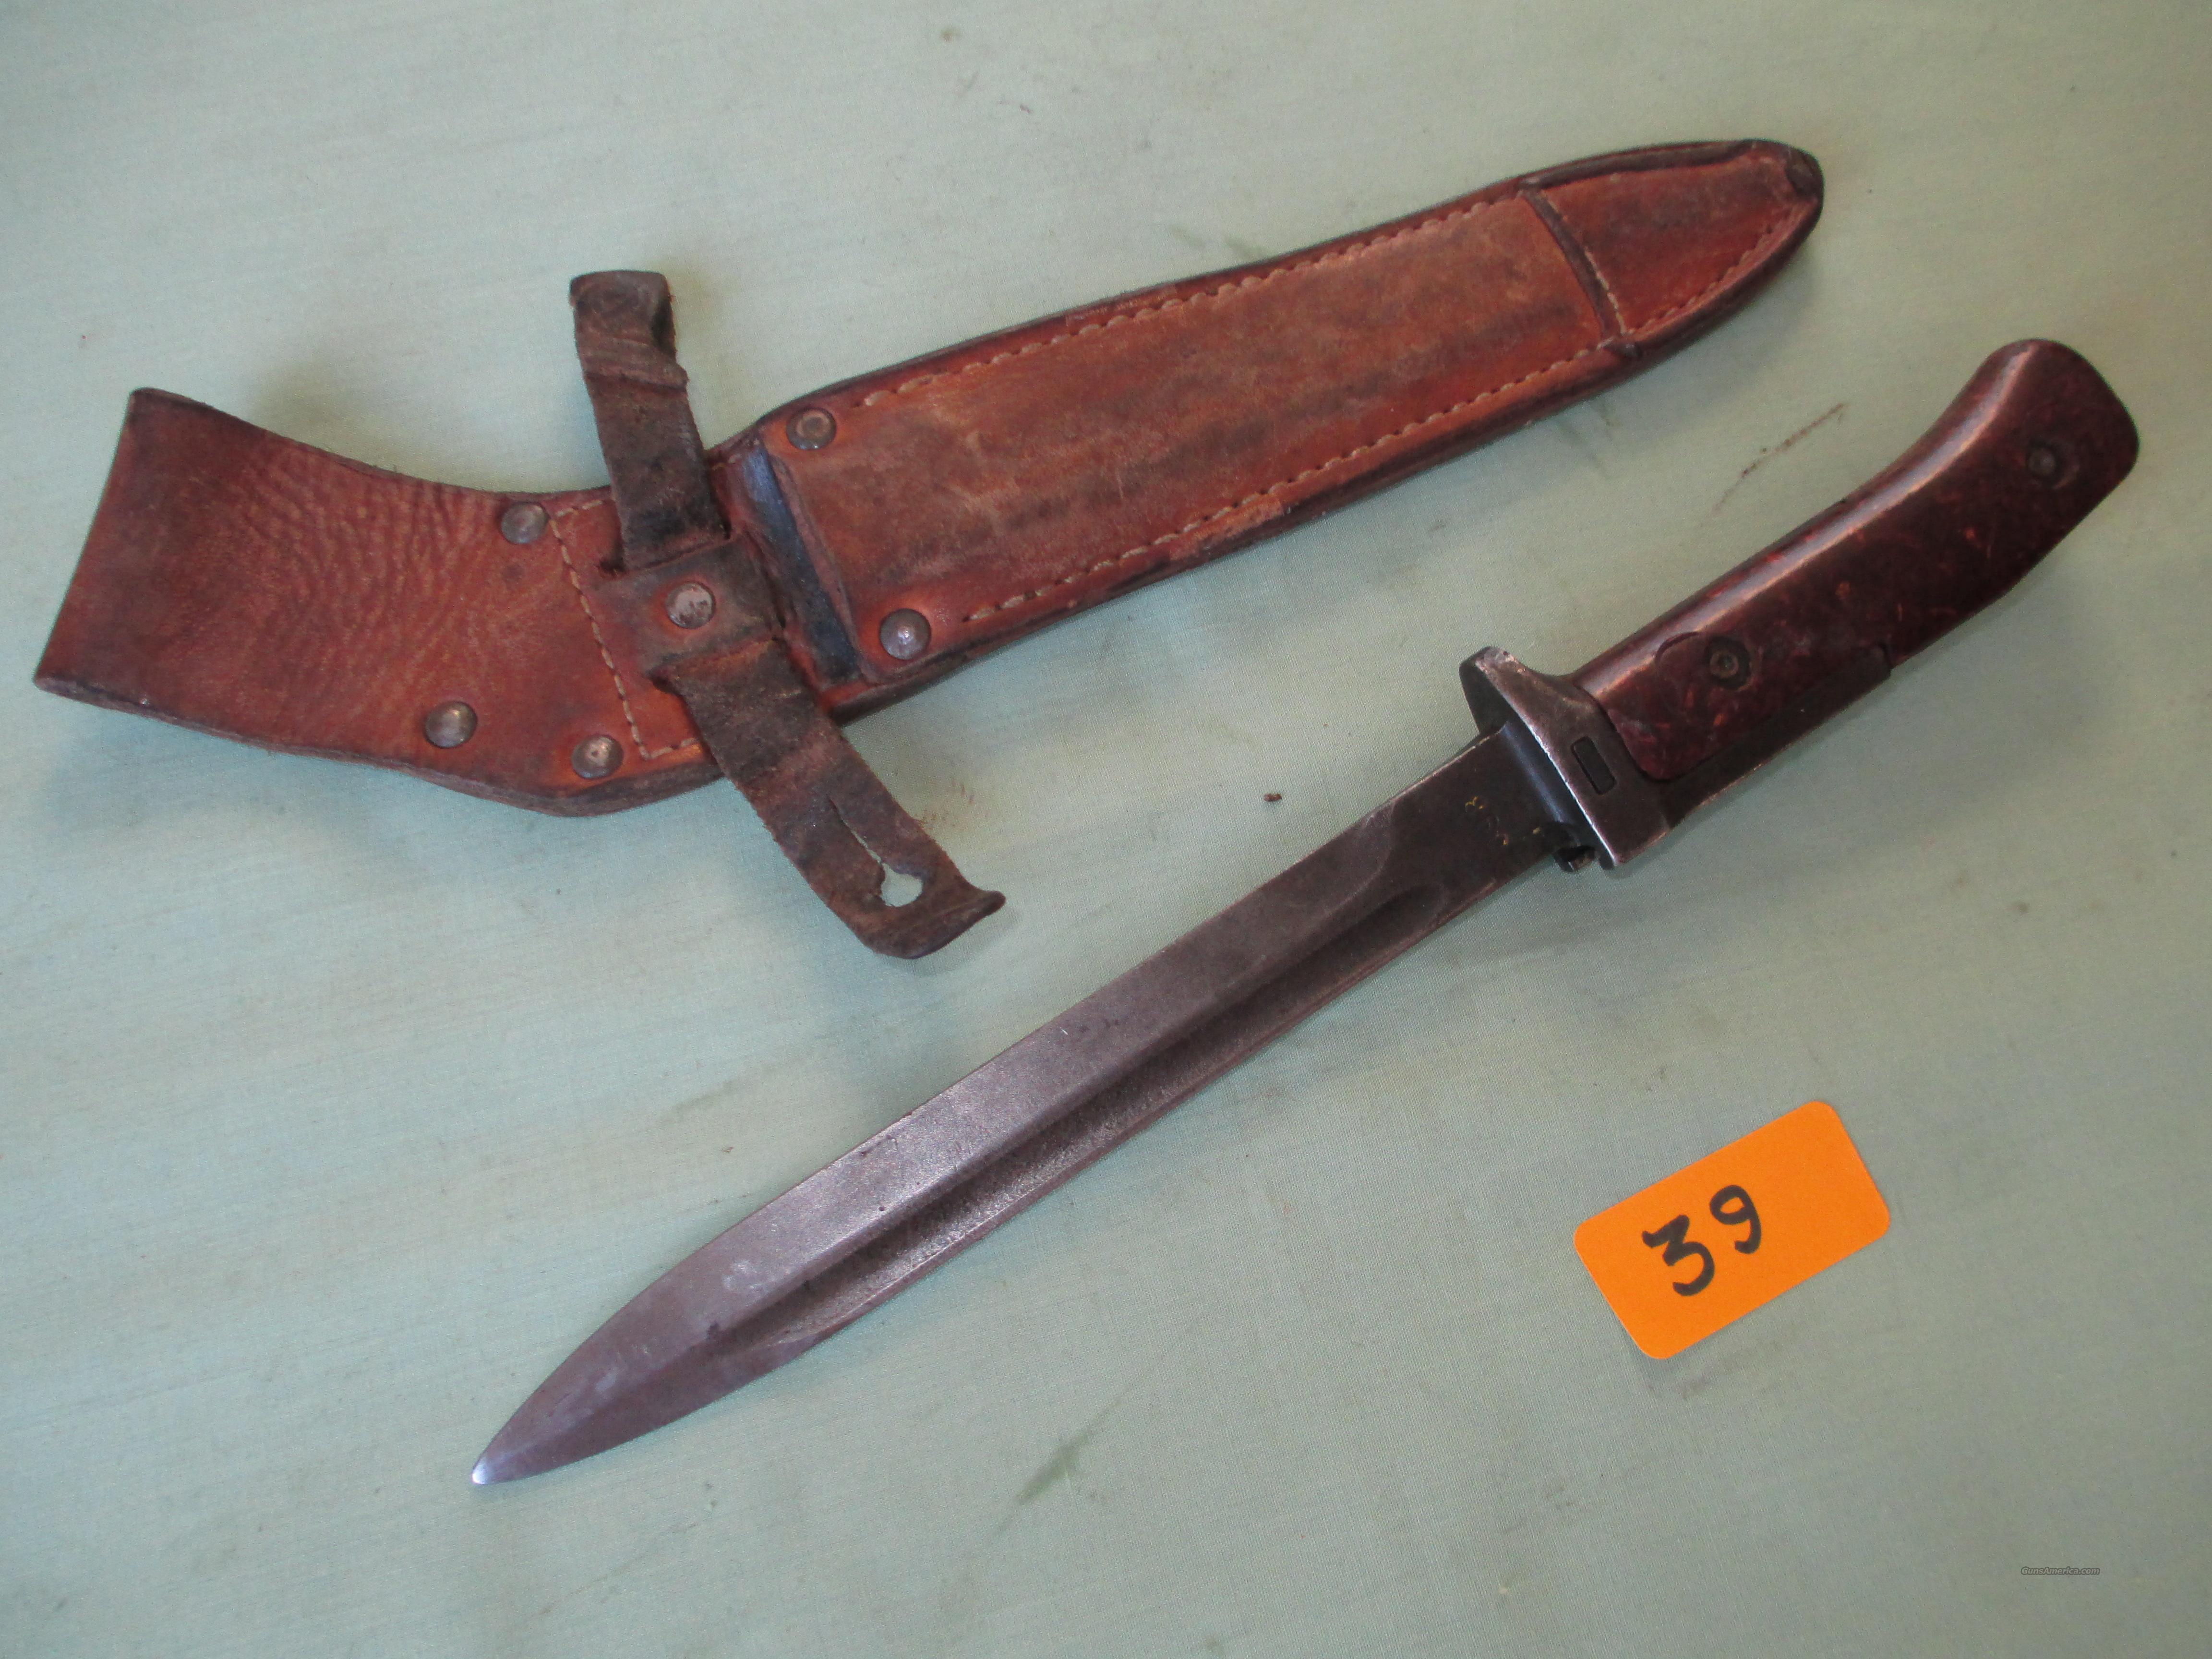 VZ58 CZECH  Non-Guns > Knives/Swords > Military > Bayonets